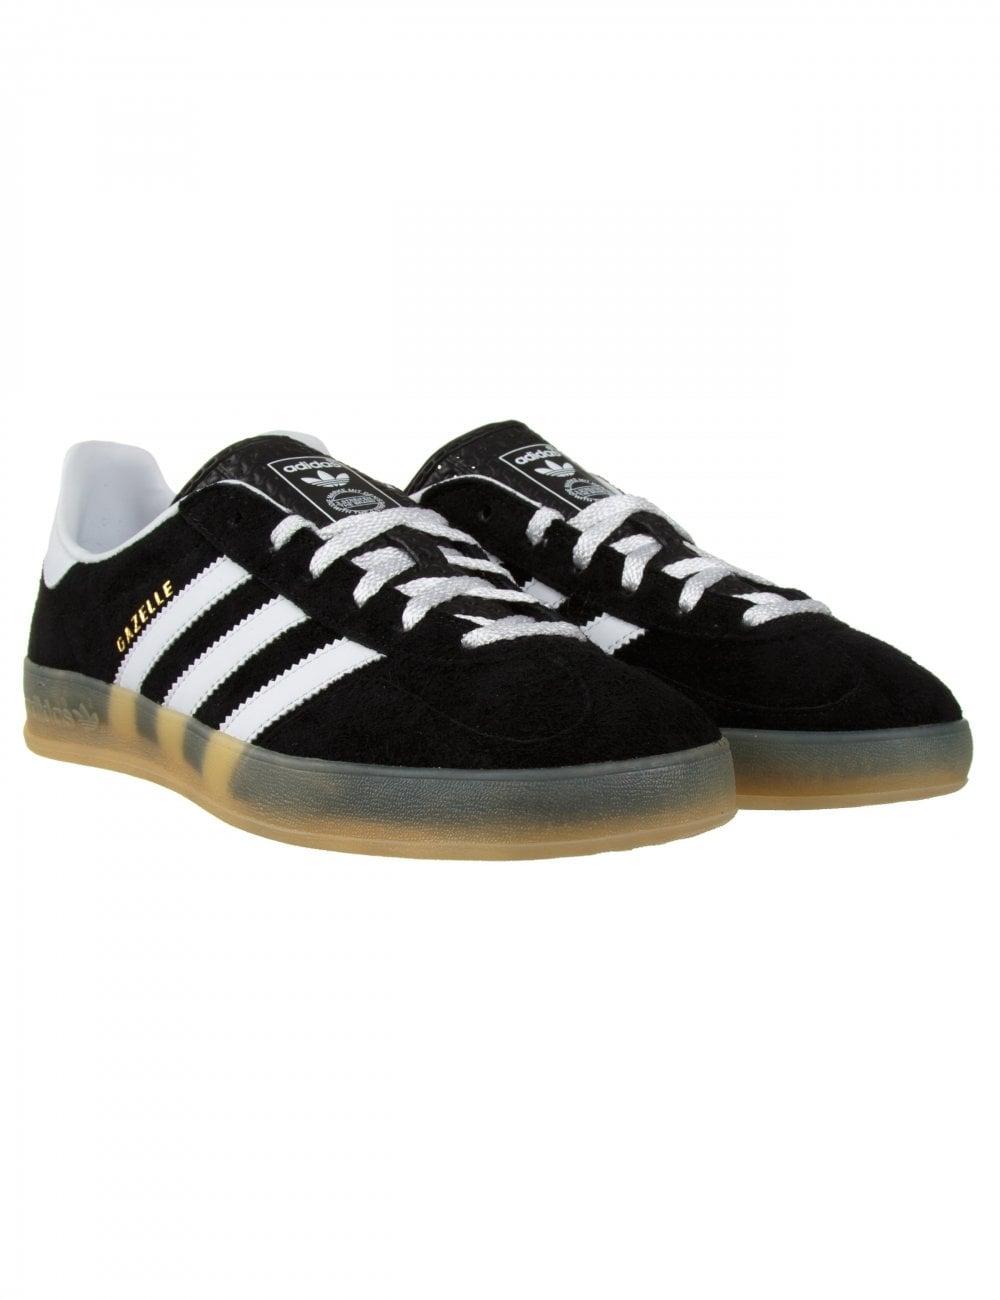 Adidas Originals Gazelle Indoor Shoes - Black - Footwear from Fat ... 7da1fed9f